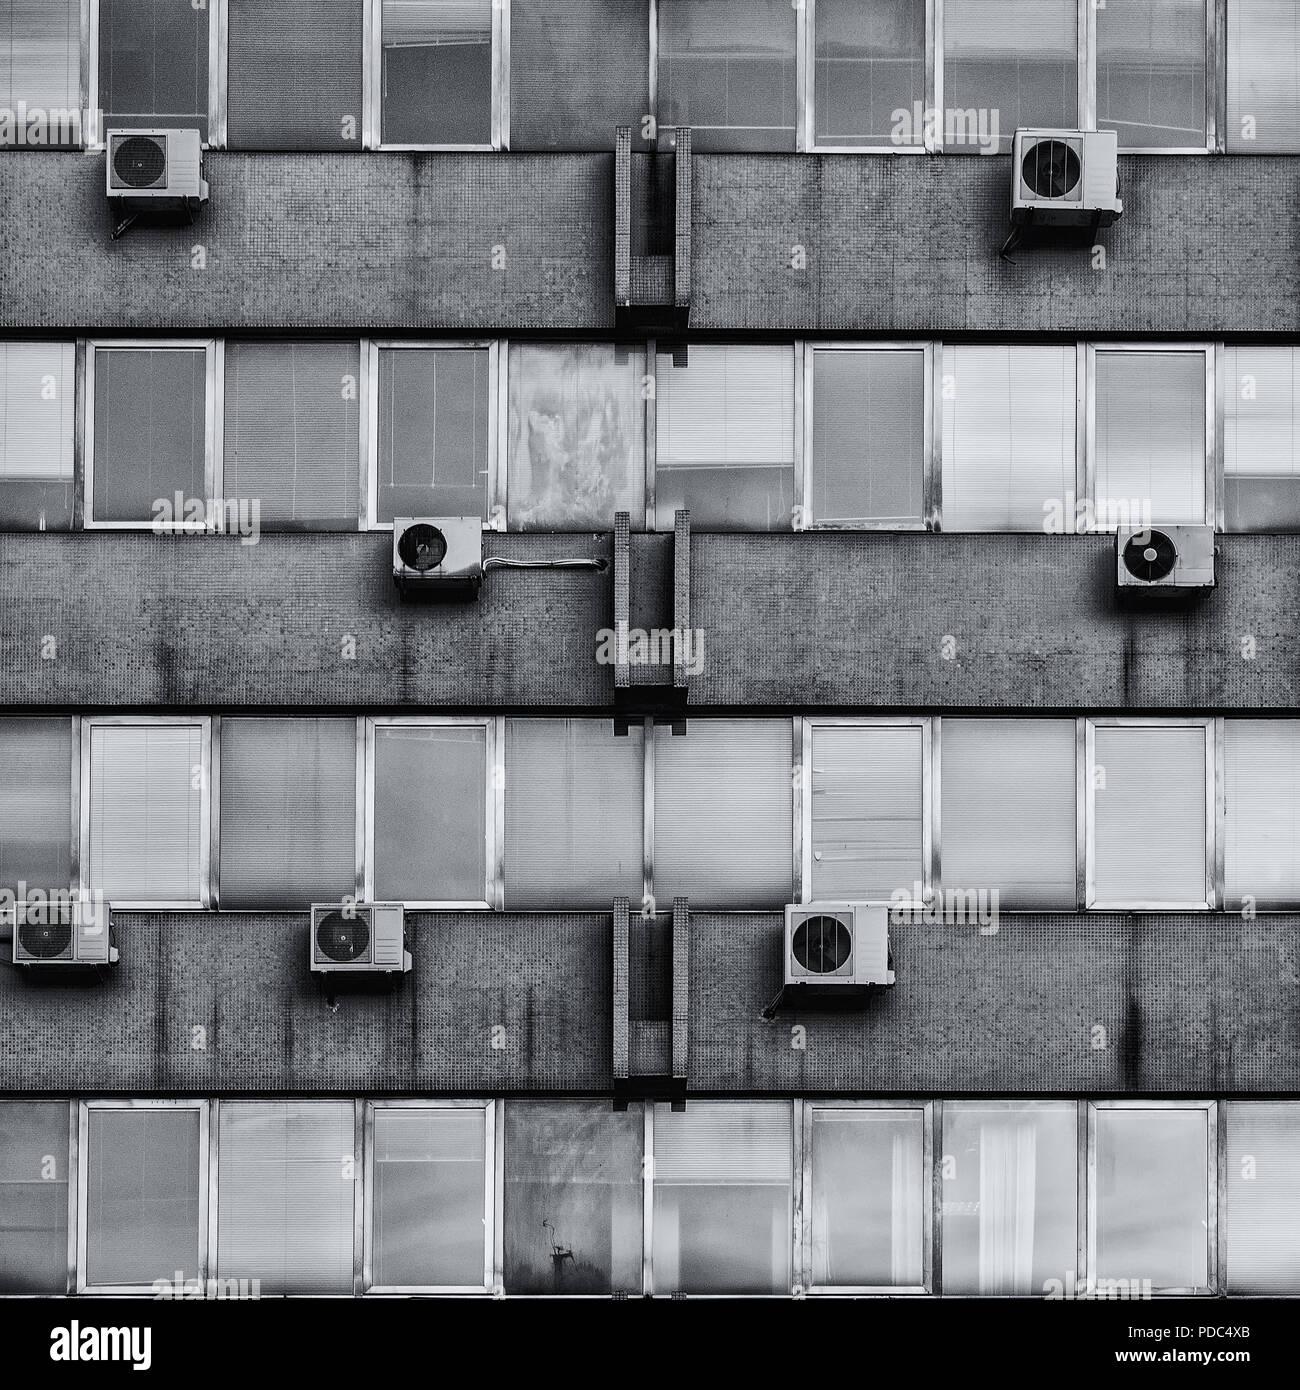 Public housing in Croatia - Stock Image